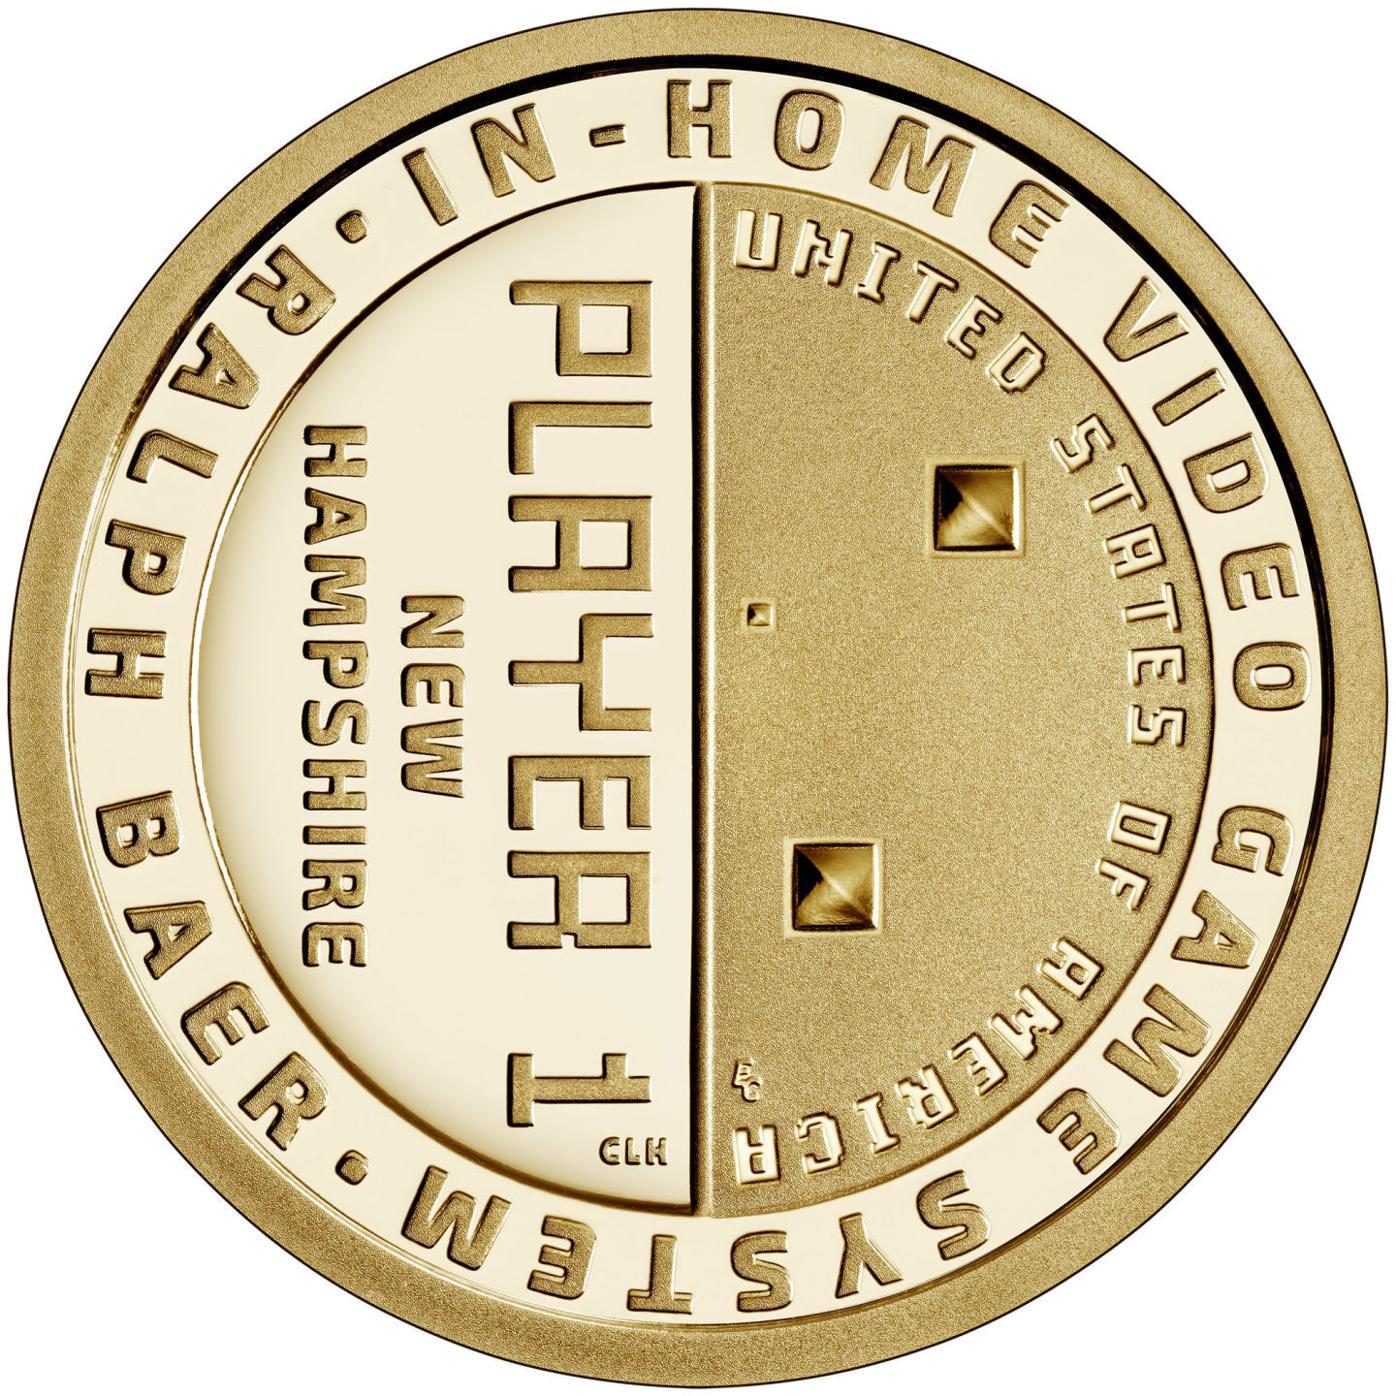 Ralph Baer coin